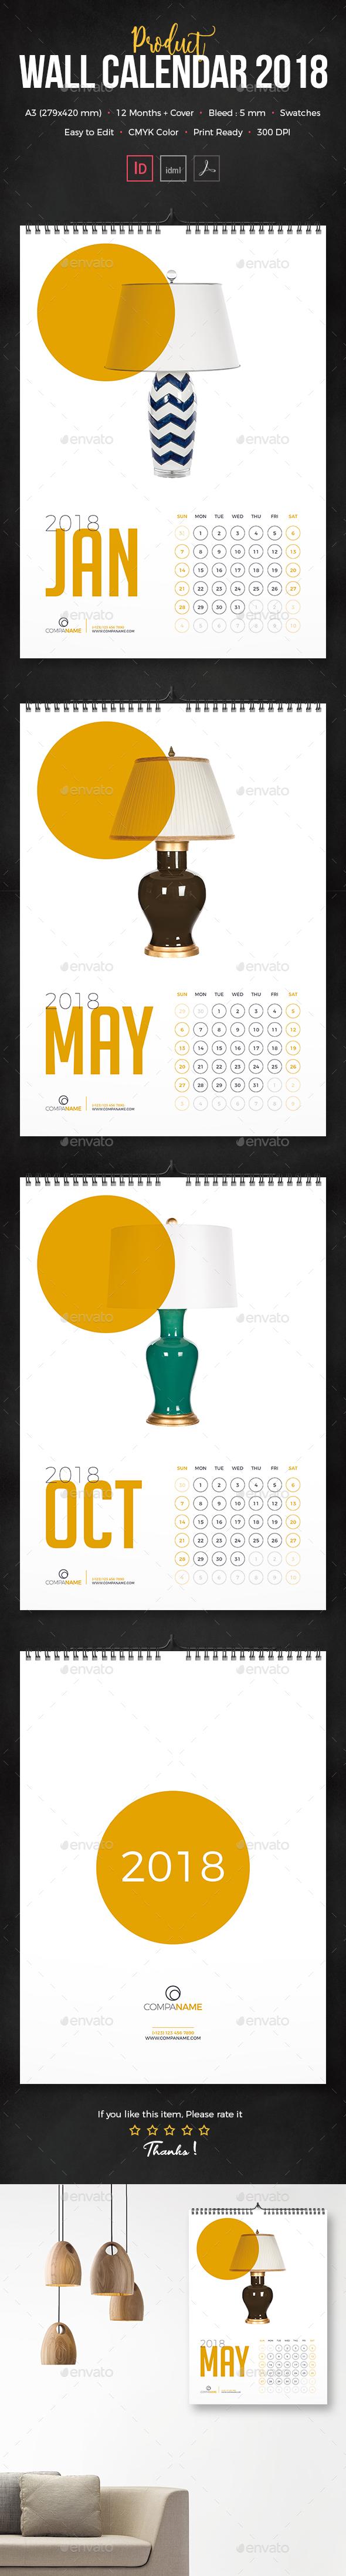 Product Calendar 2018 - Calendars Stationery